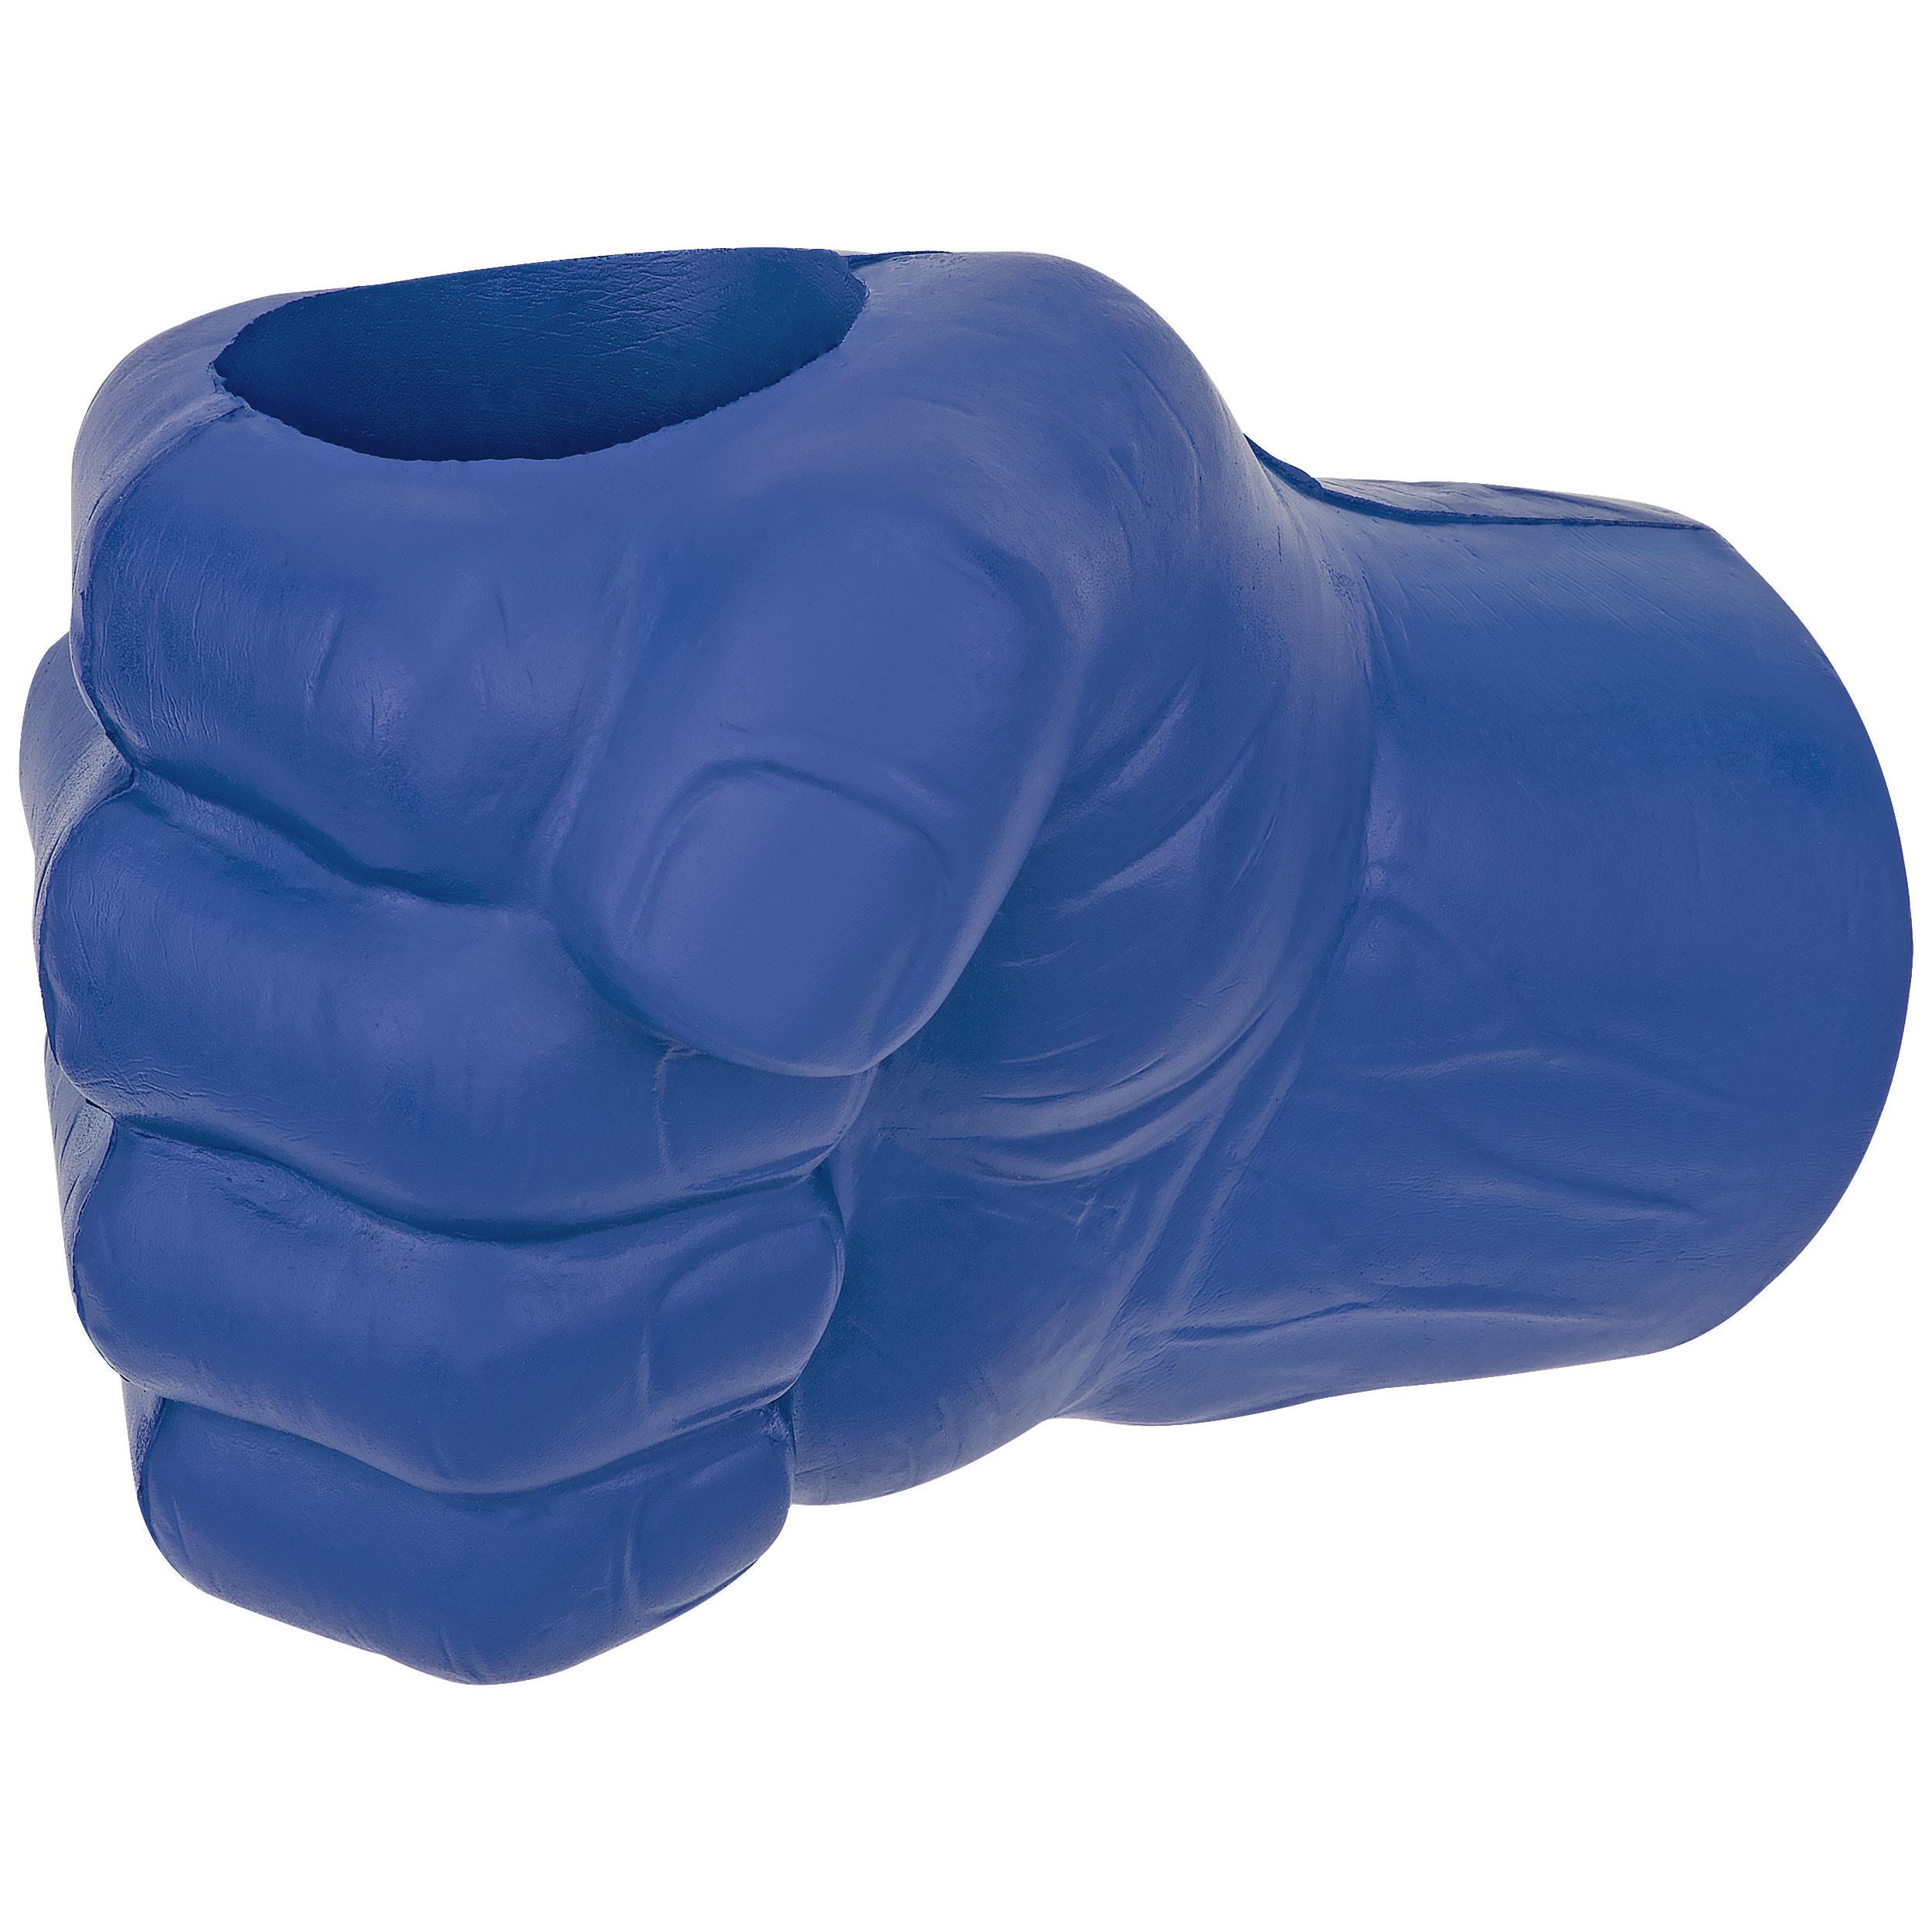 Fairly Odd Novelties Giant Foam Fist Hand Cooler Novelty, Right Hand, Blue